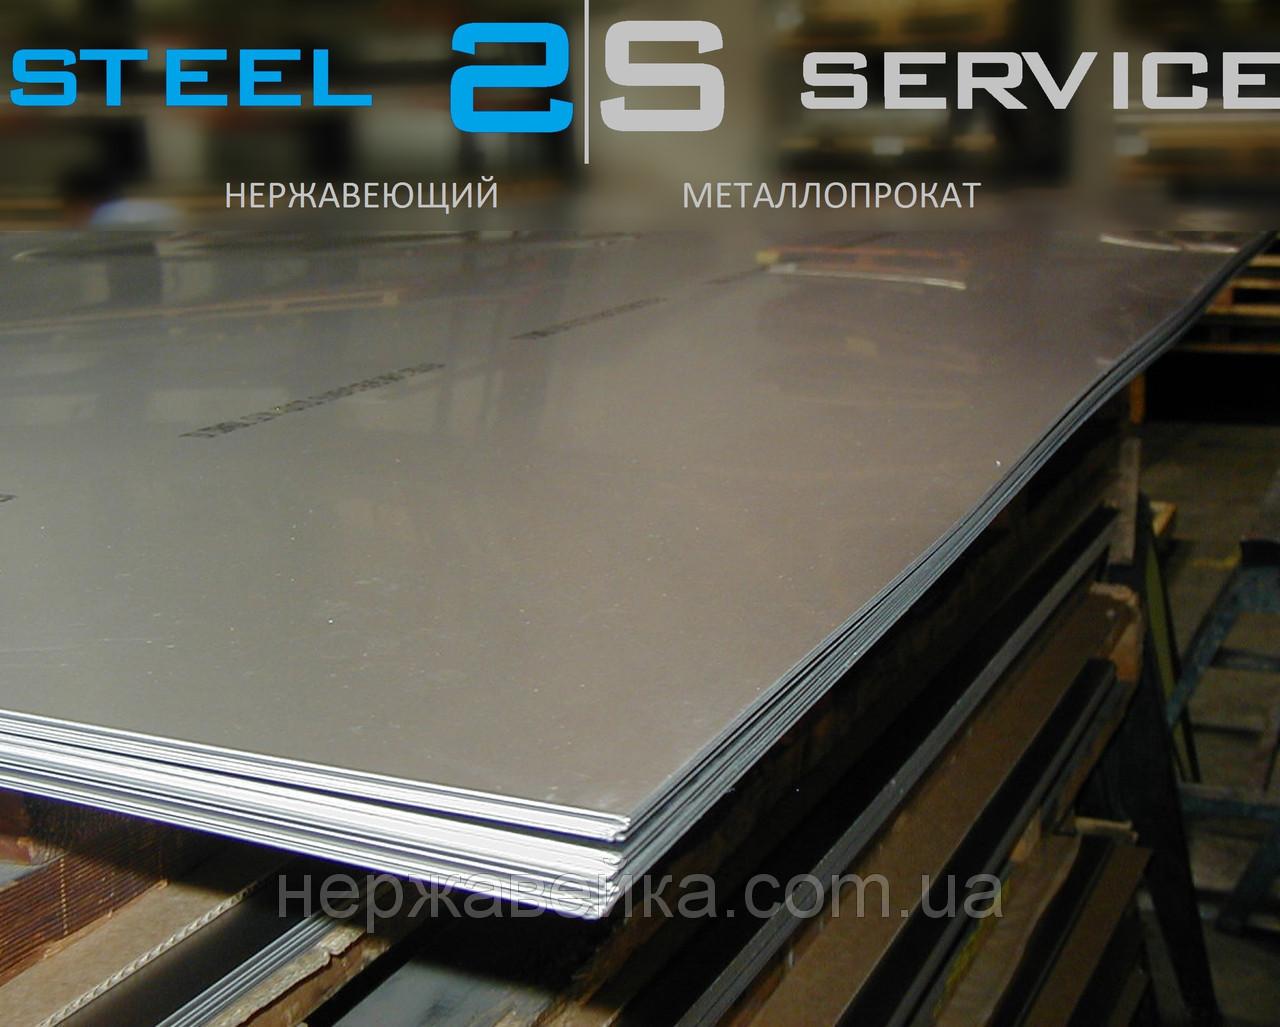 Нержавейка лист 6х1500х6000мм AISI 316L(03Х17Н14М3) F1 - горячекатанный,  кислотостойкий